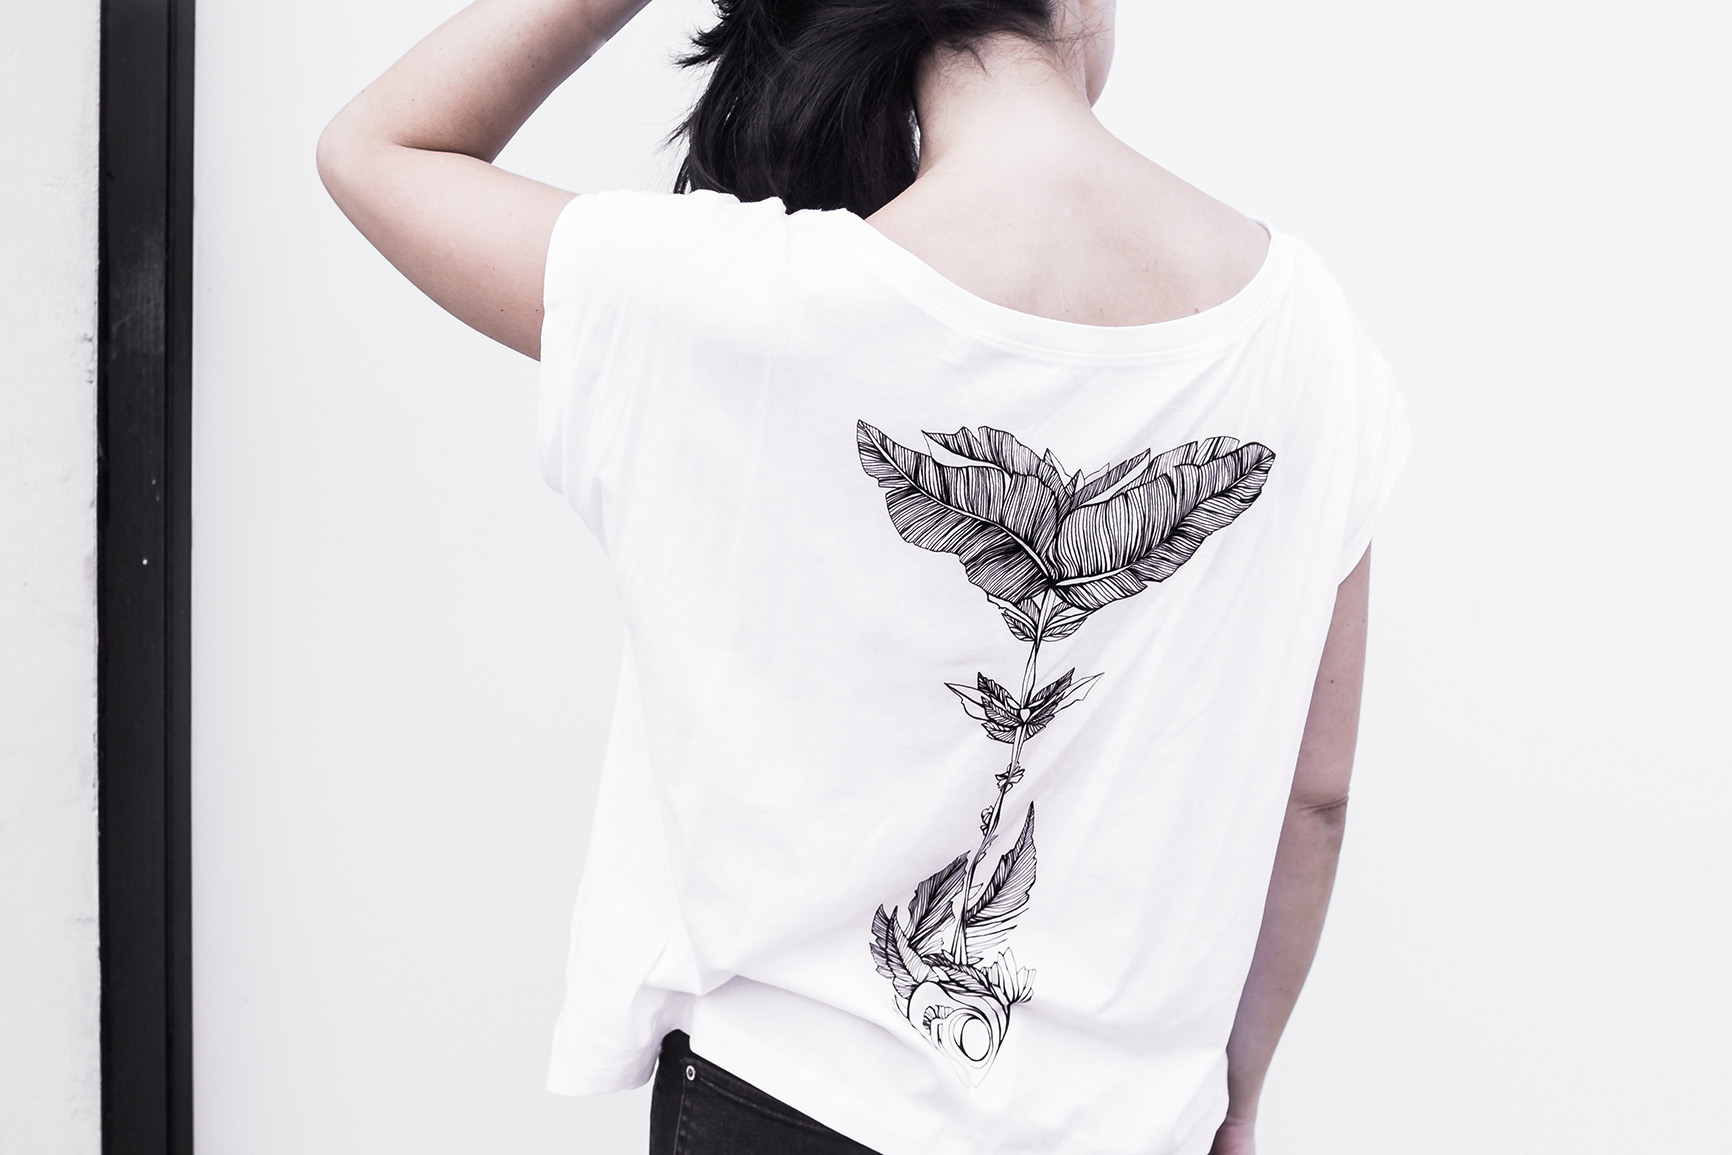 t-shirtgraphisme Poisson collectionete 18 silowane